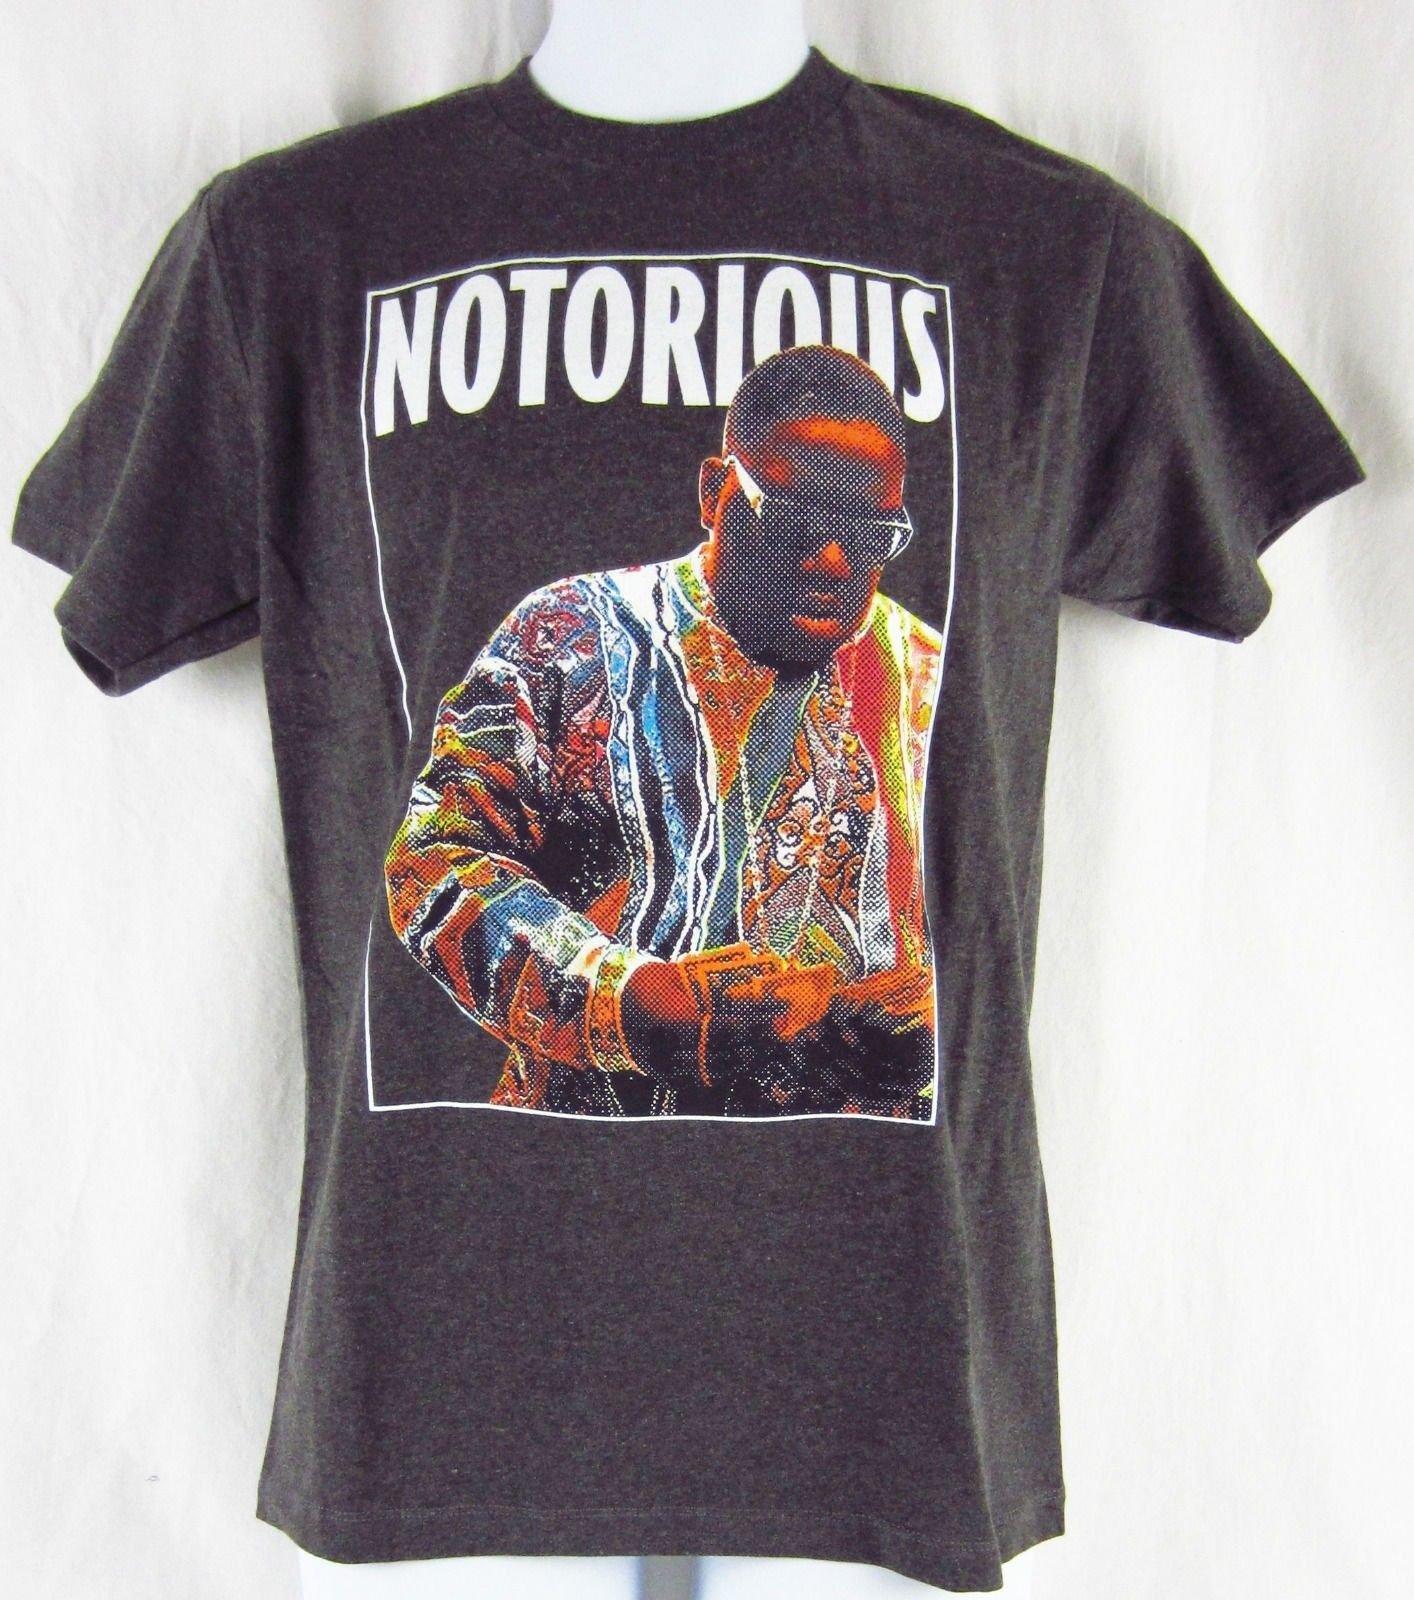 08fda145a64b28 Mens New Biggie Notorious BIG Heathered Grey Gray T-Shirt Size S M L XL 2XL